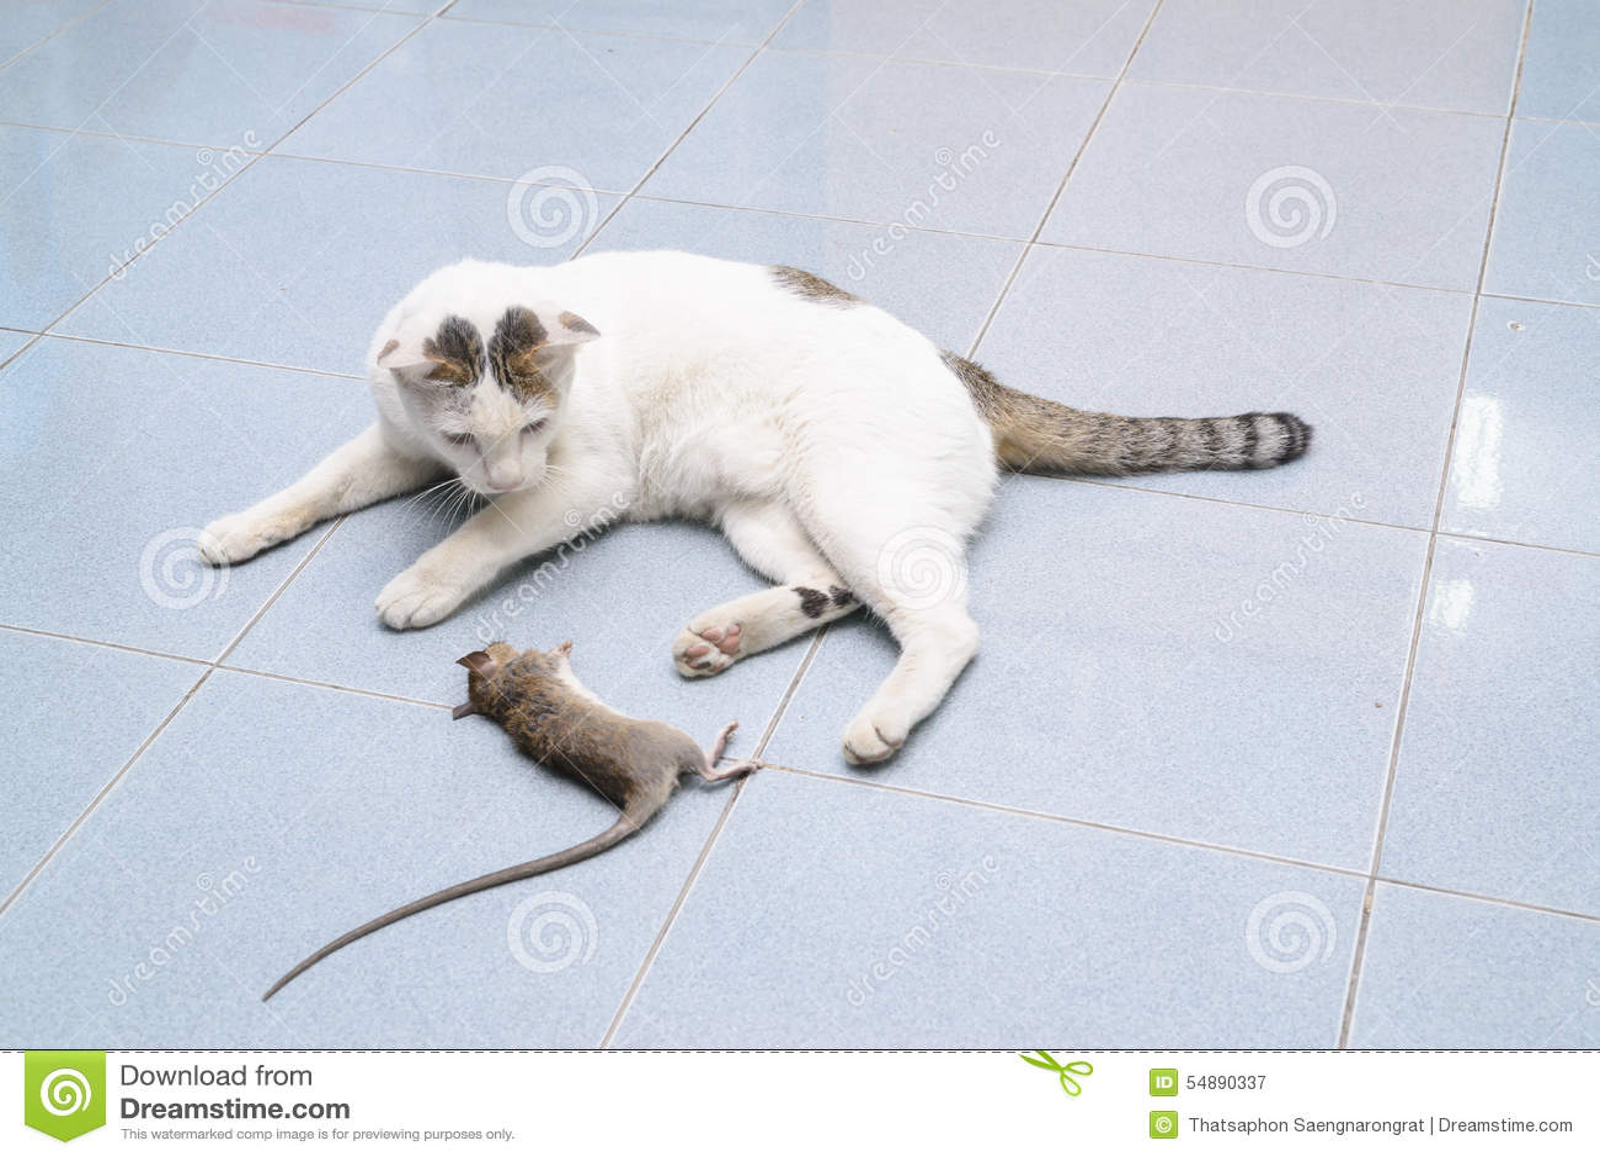 kitten broken leg symptoms